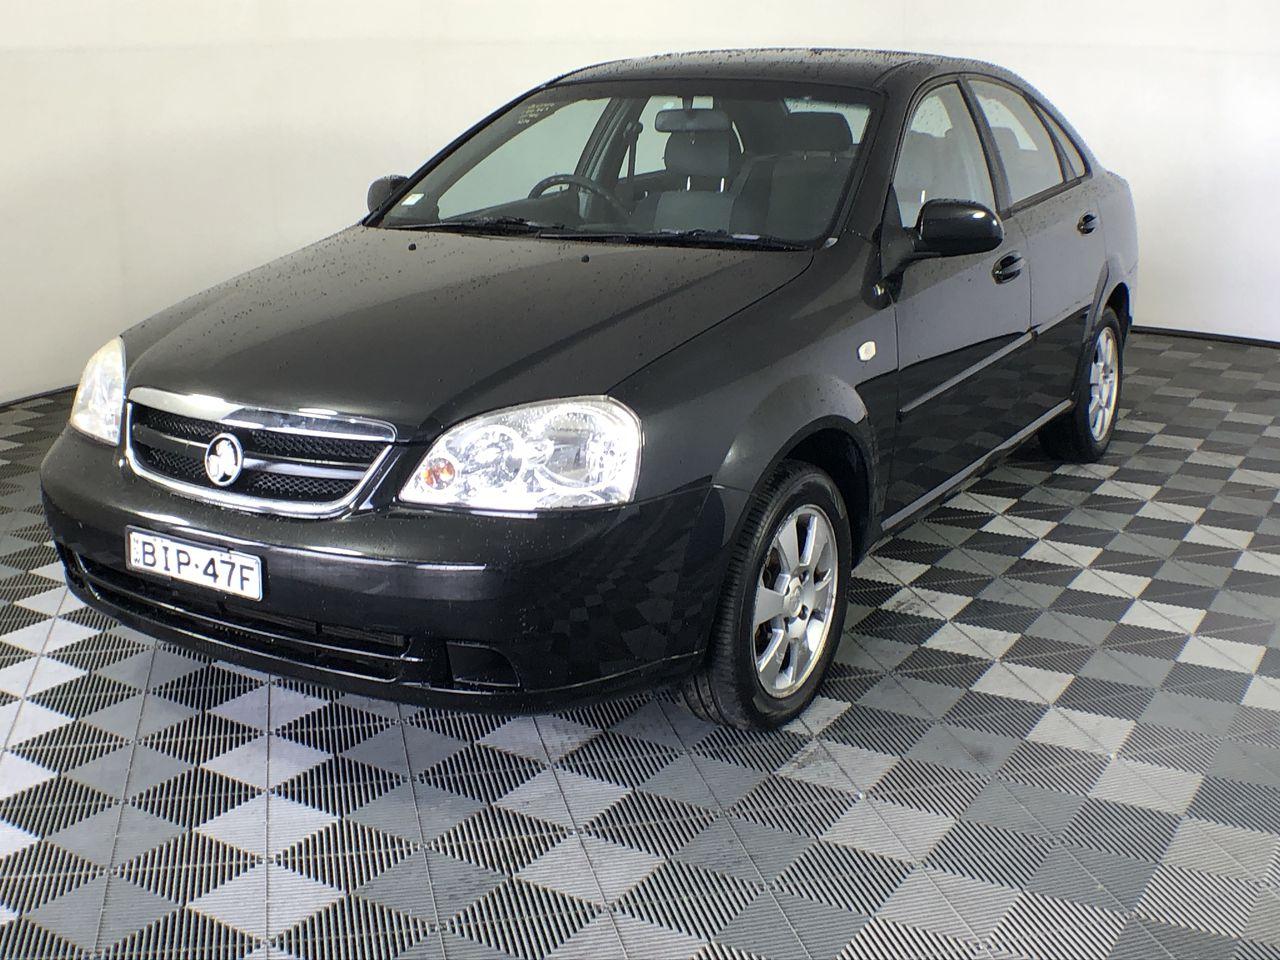 2008 Holden Viva JF Automatic Sedan